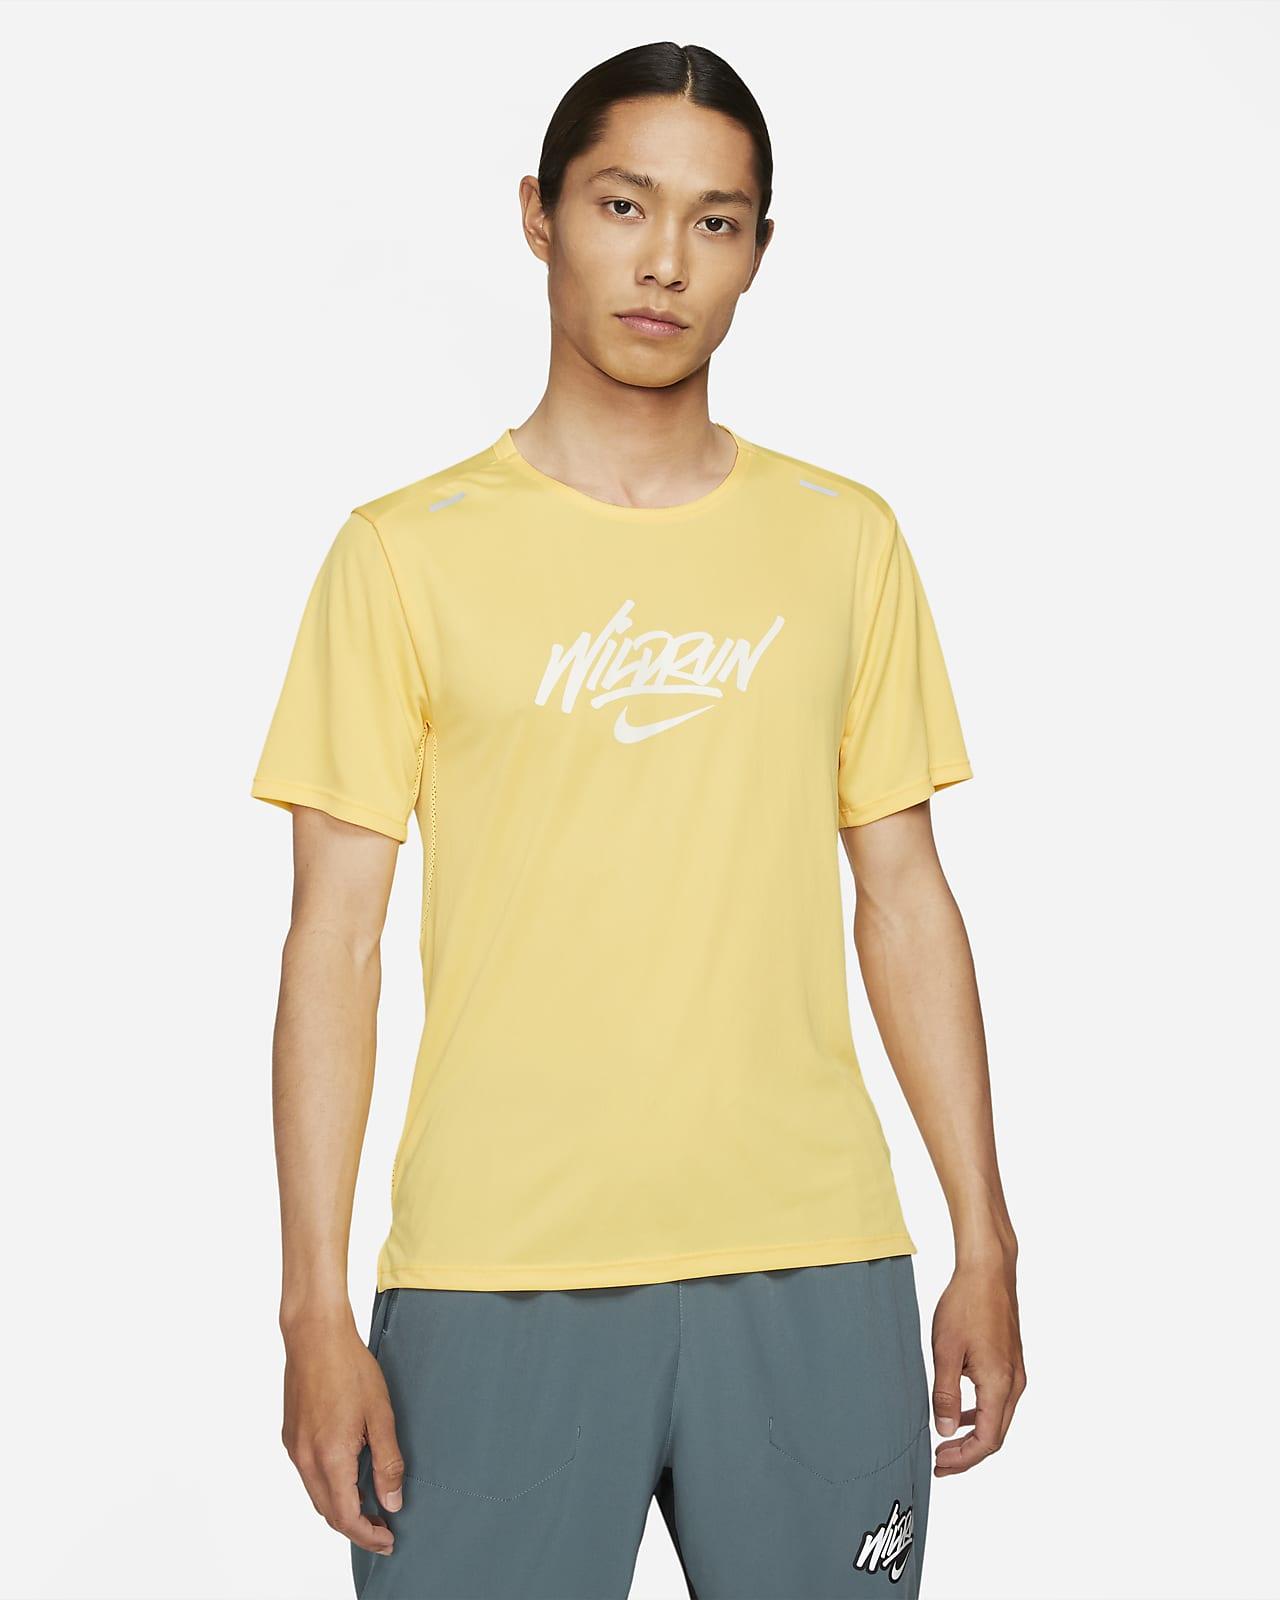 Nike Rise 365 Wild Run Men's Short-Sleeve Running Top